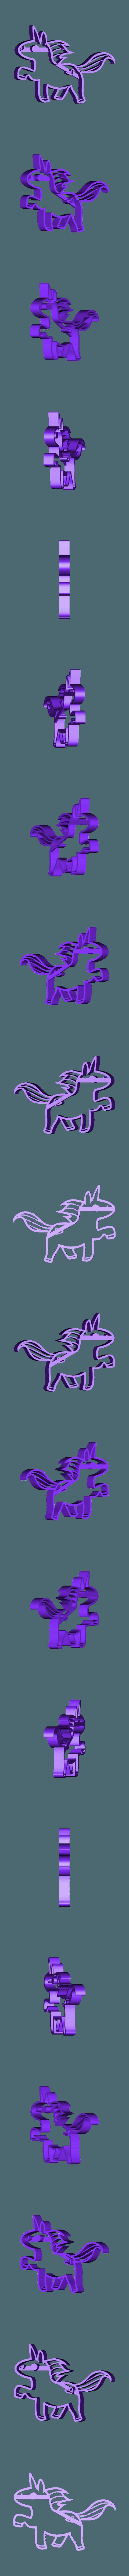 unicorn5.stl Download STL file  8 X UNICORN COOKIE CUTTER • Object to 3D print, mariospeed